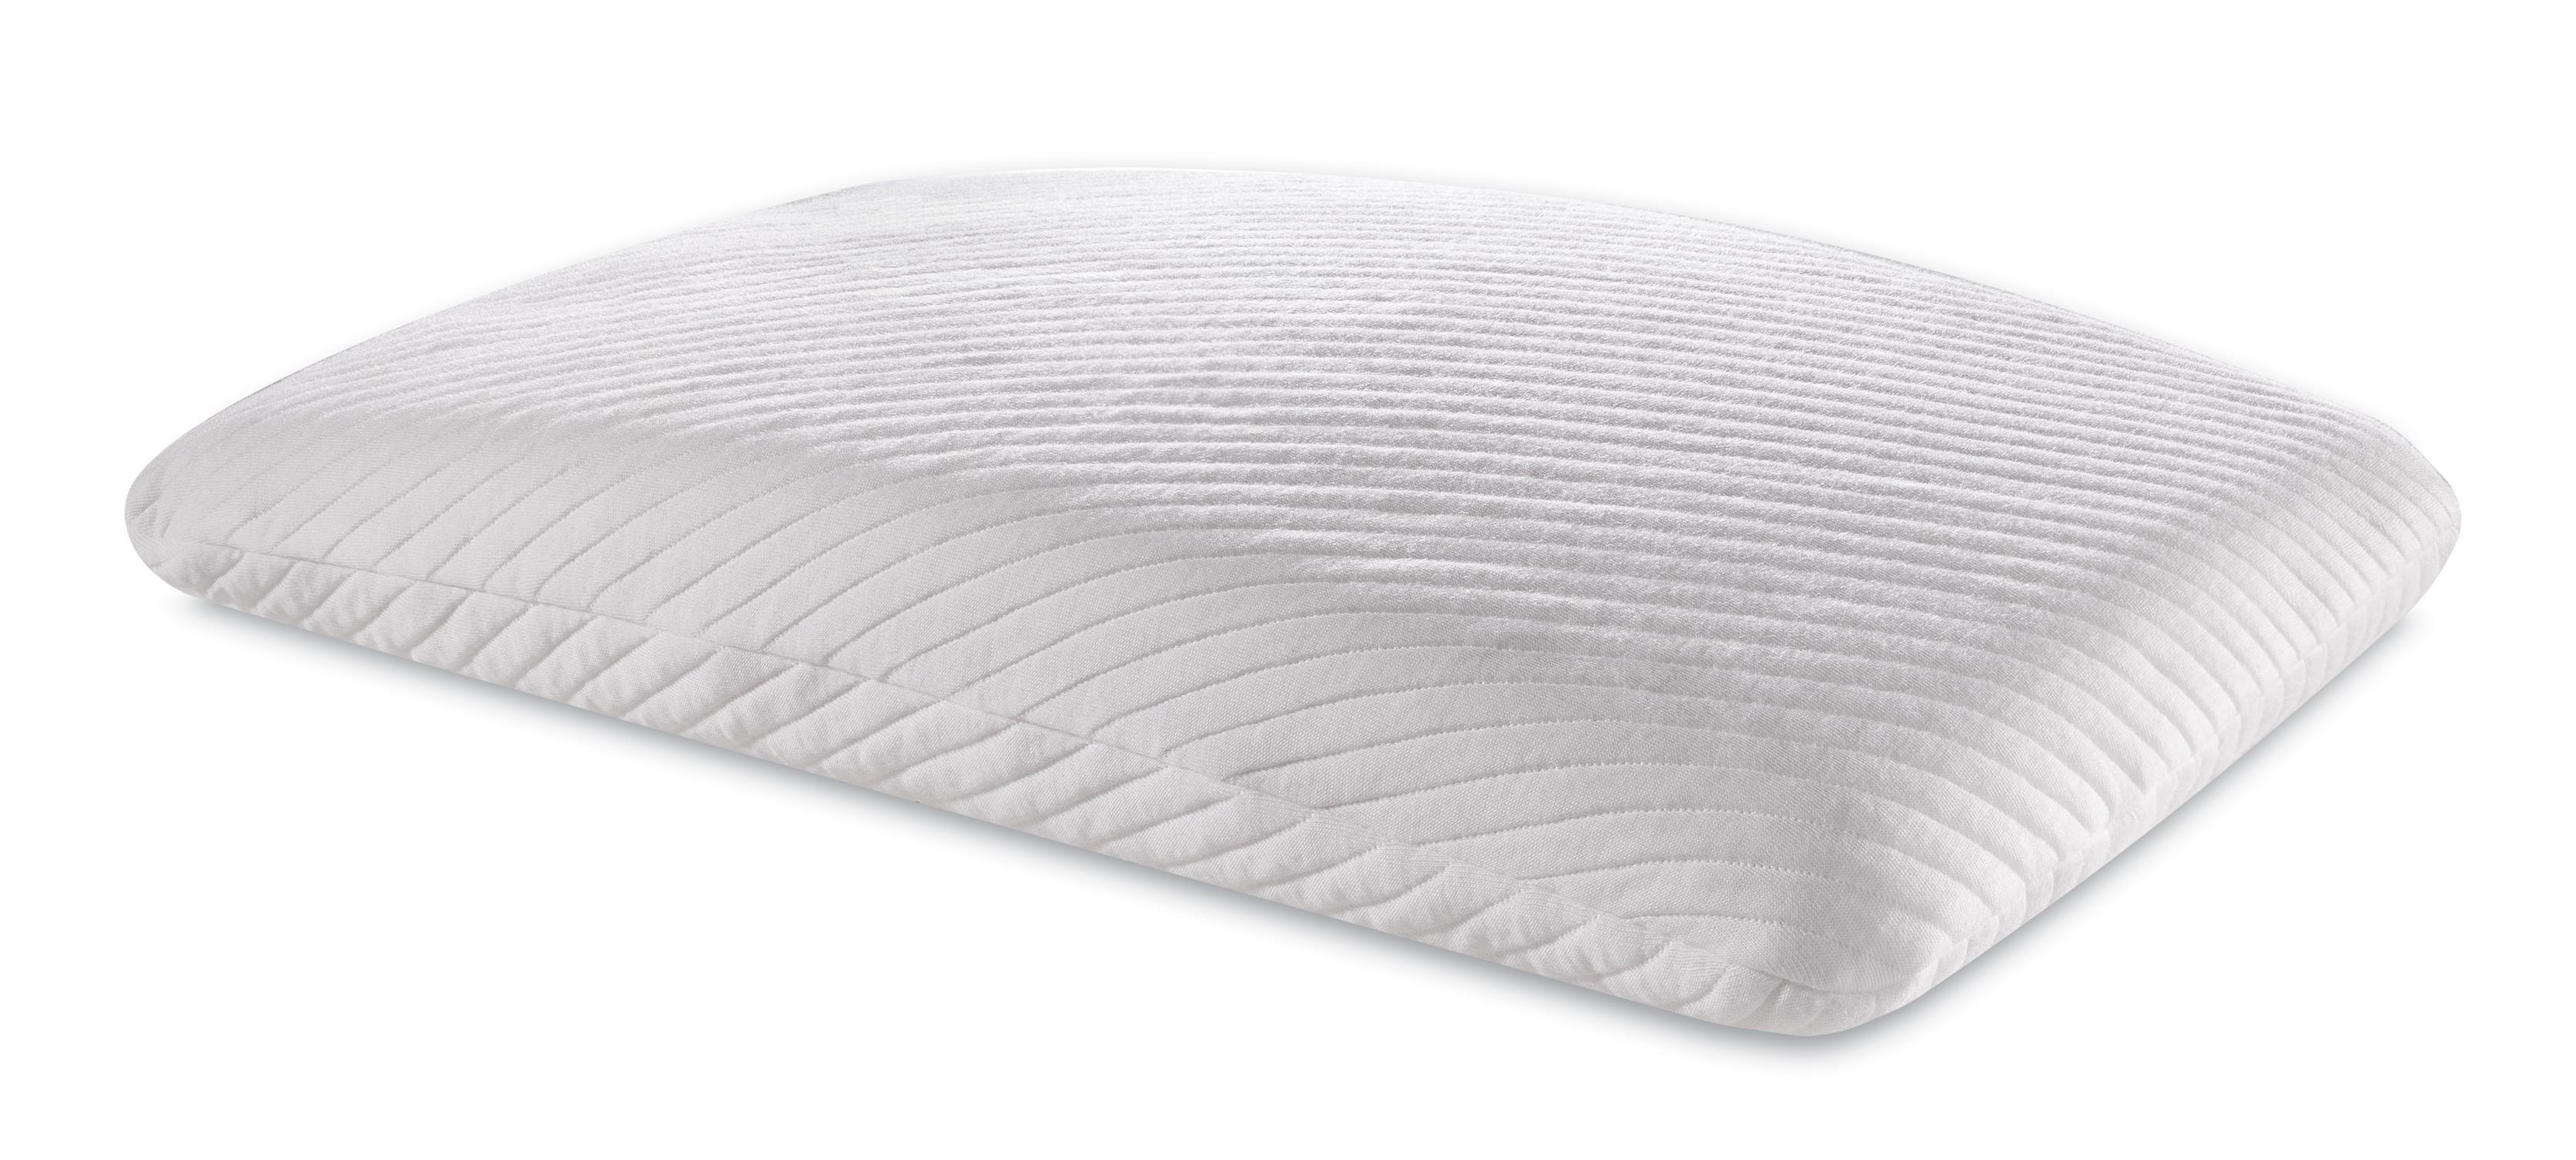 tempur pedic tempur pillows tempur essential support pillow olinde 39 s furniture pillows. Black Bedroom Furniture Sets. Home Design Ideas